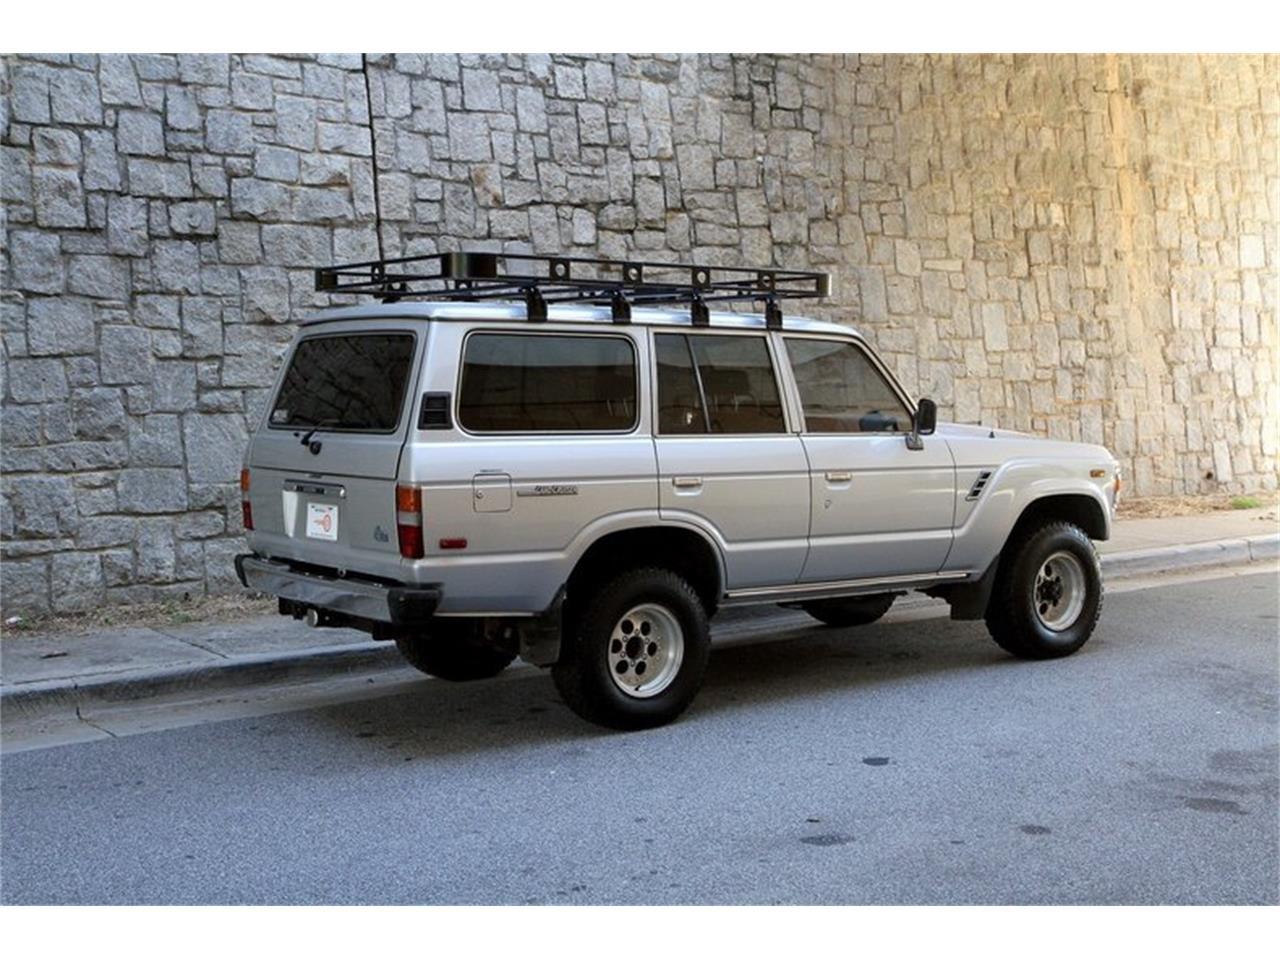 For Sale: 1986 Toyota Land Cruiser FJ in Atlanta, Georgia